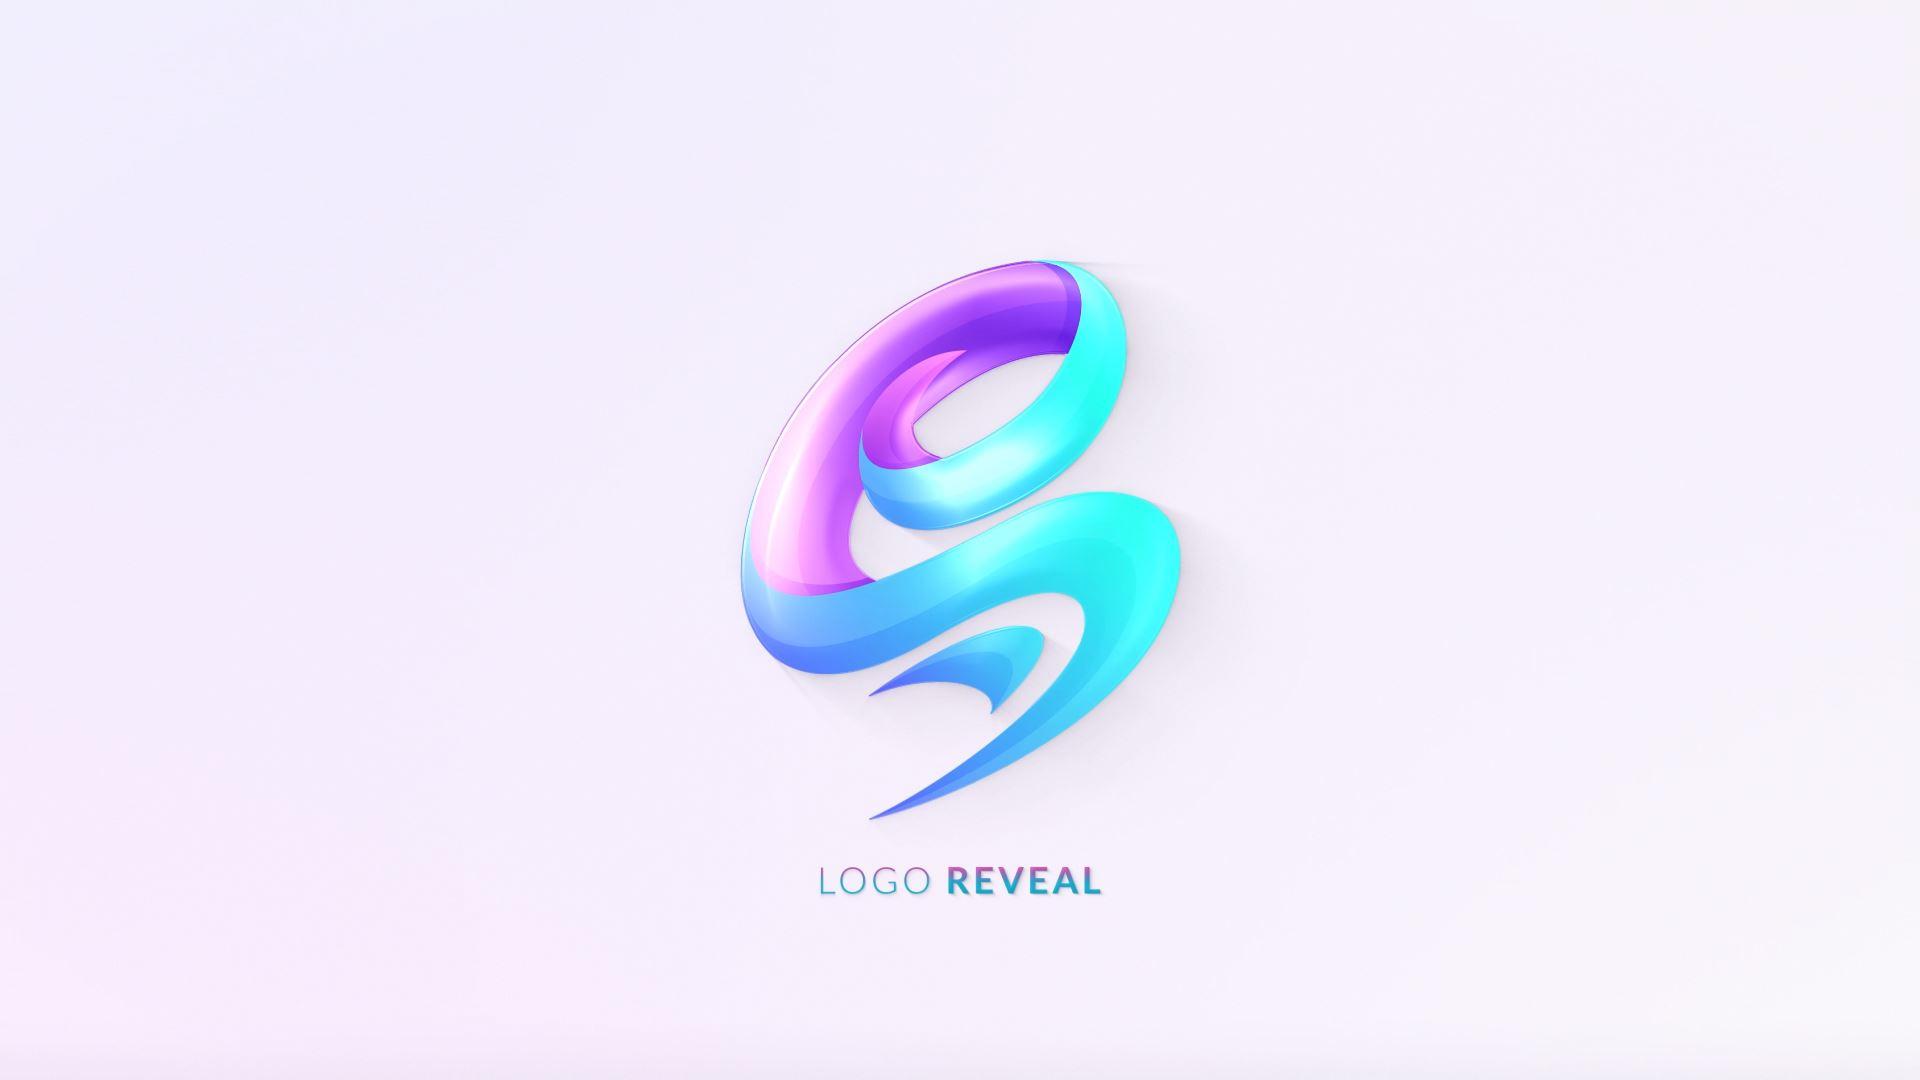 Trendy Simple Logo Reveal - 1